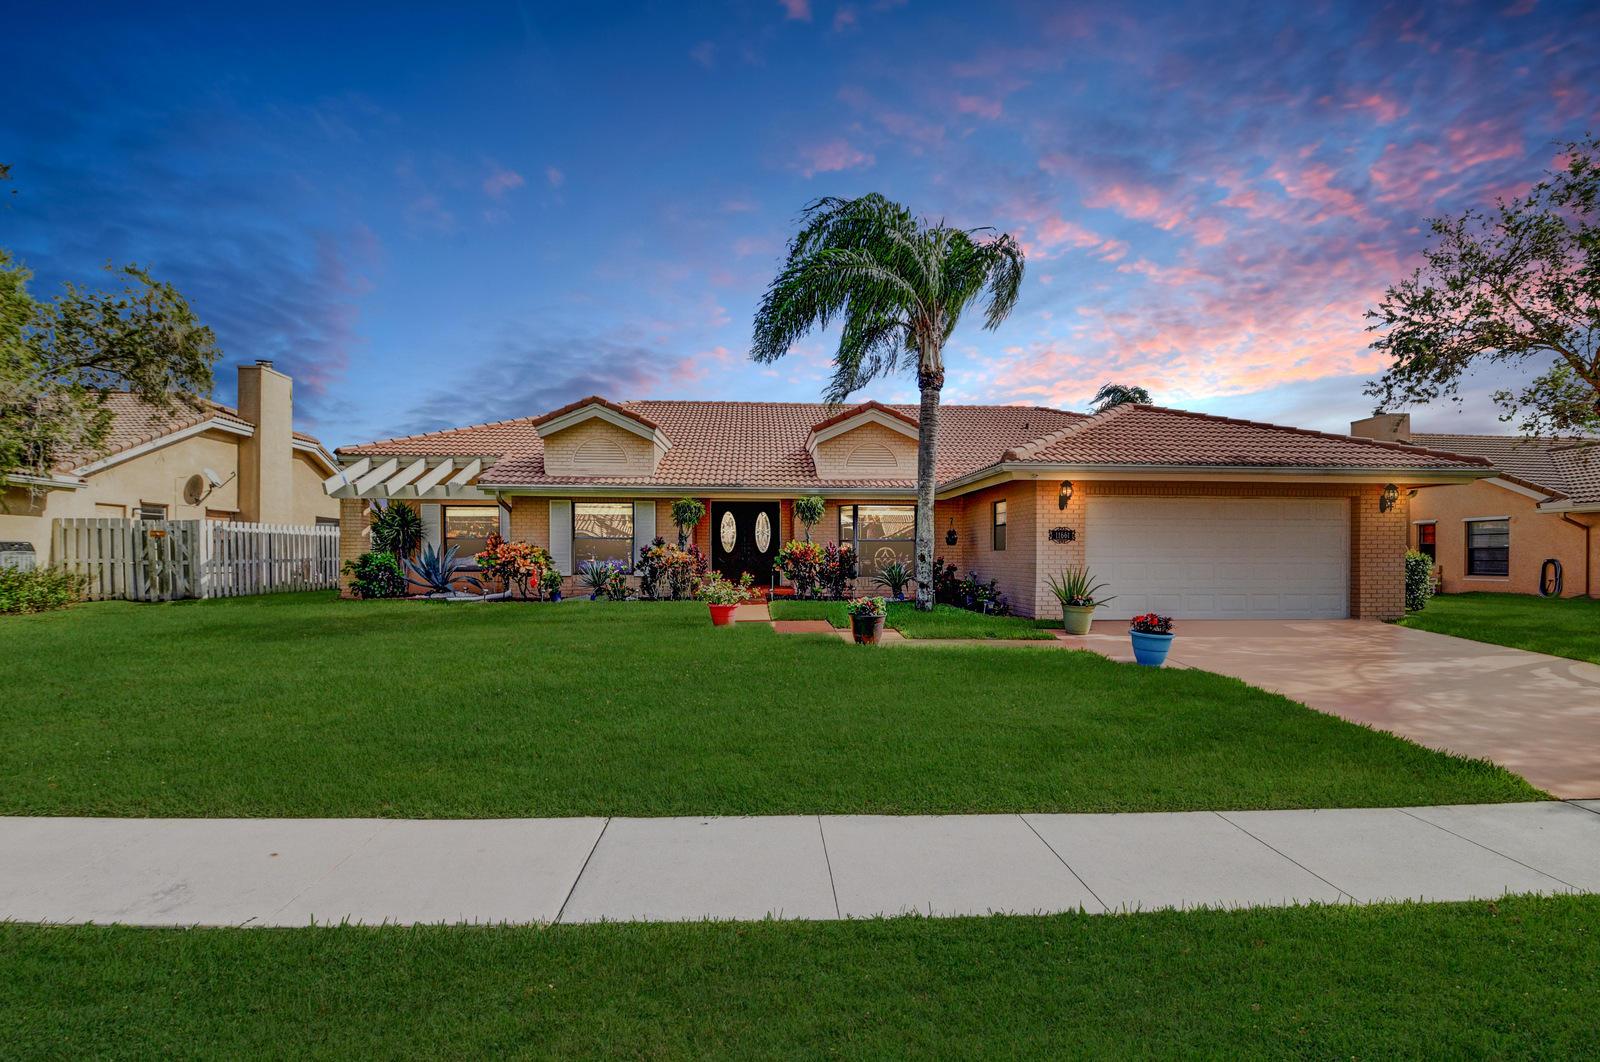 Home for sale in Island Lakes Boca Raton Florida